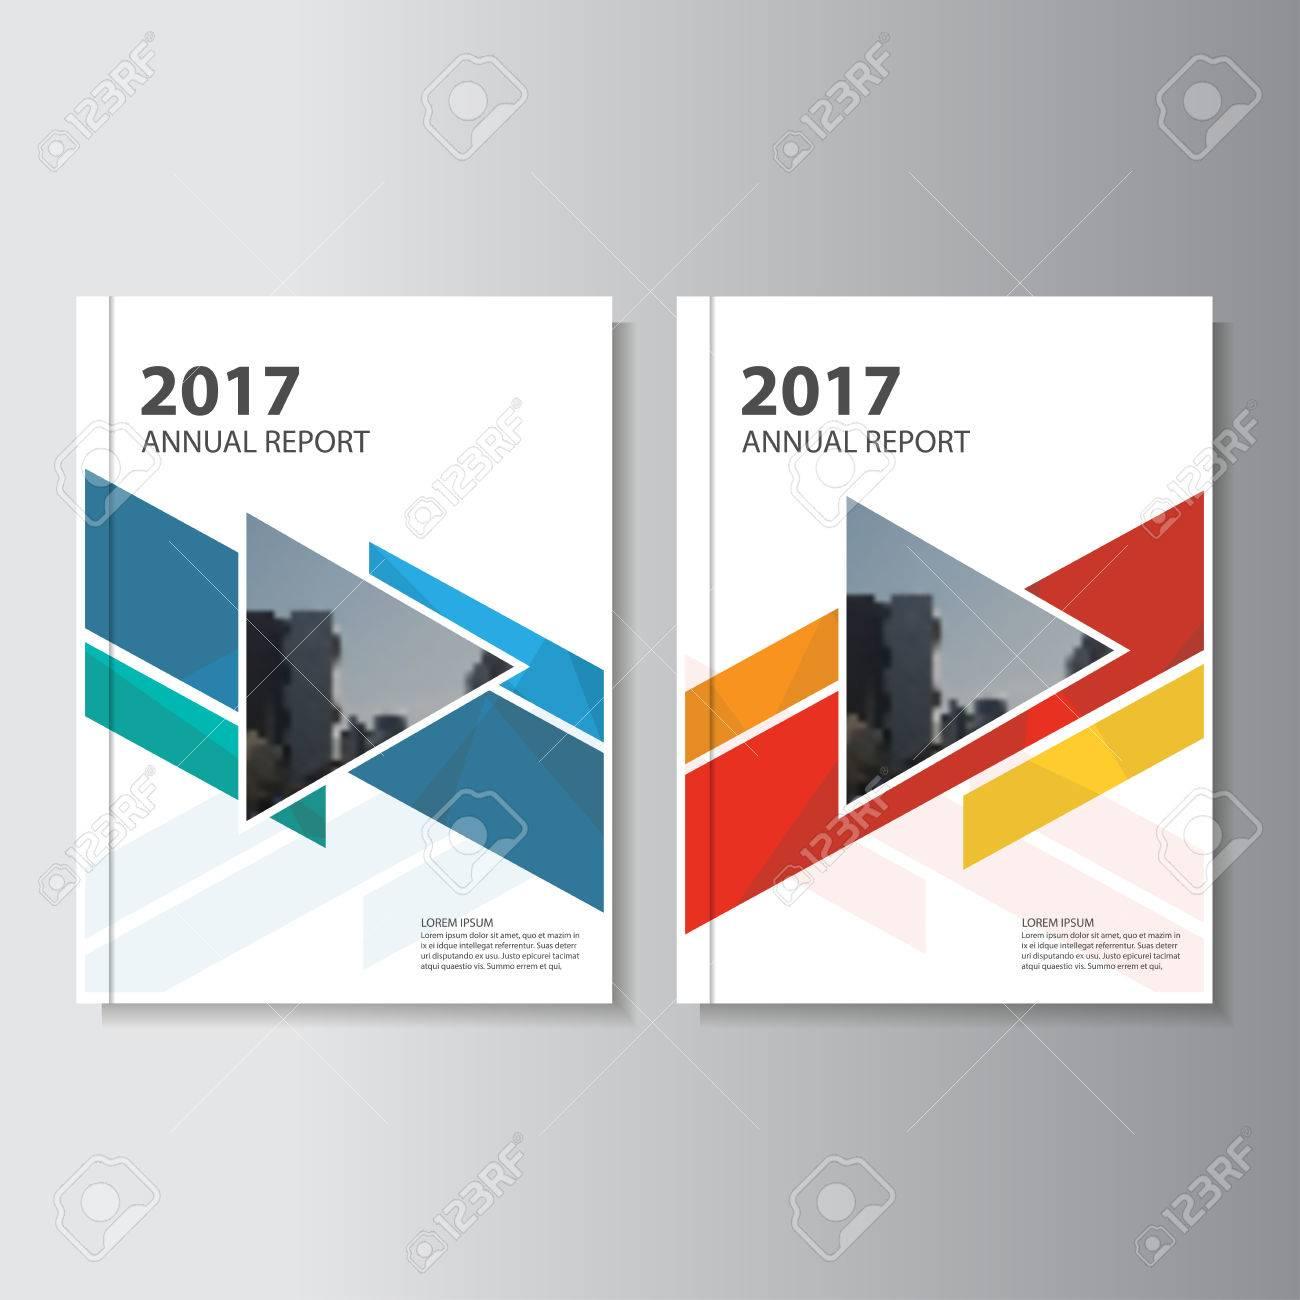 Informe Anual Folleto Folleto De Diseño Colorido Plantilla, Diseño ...